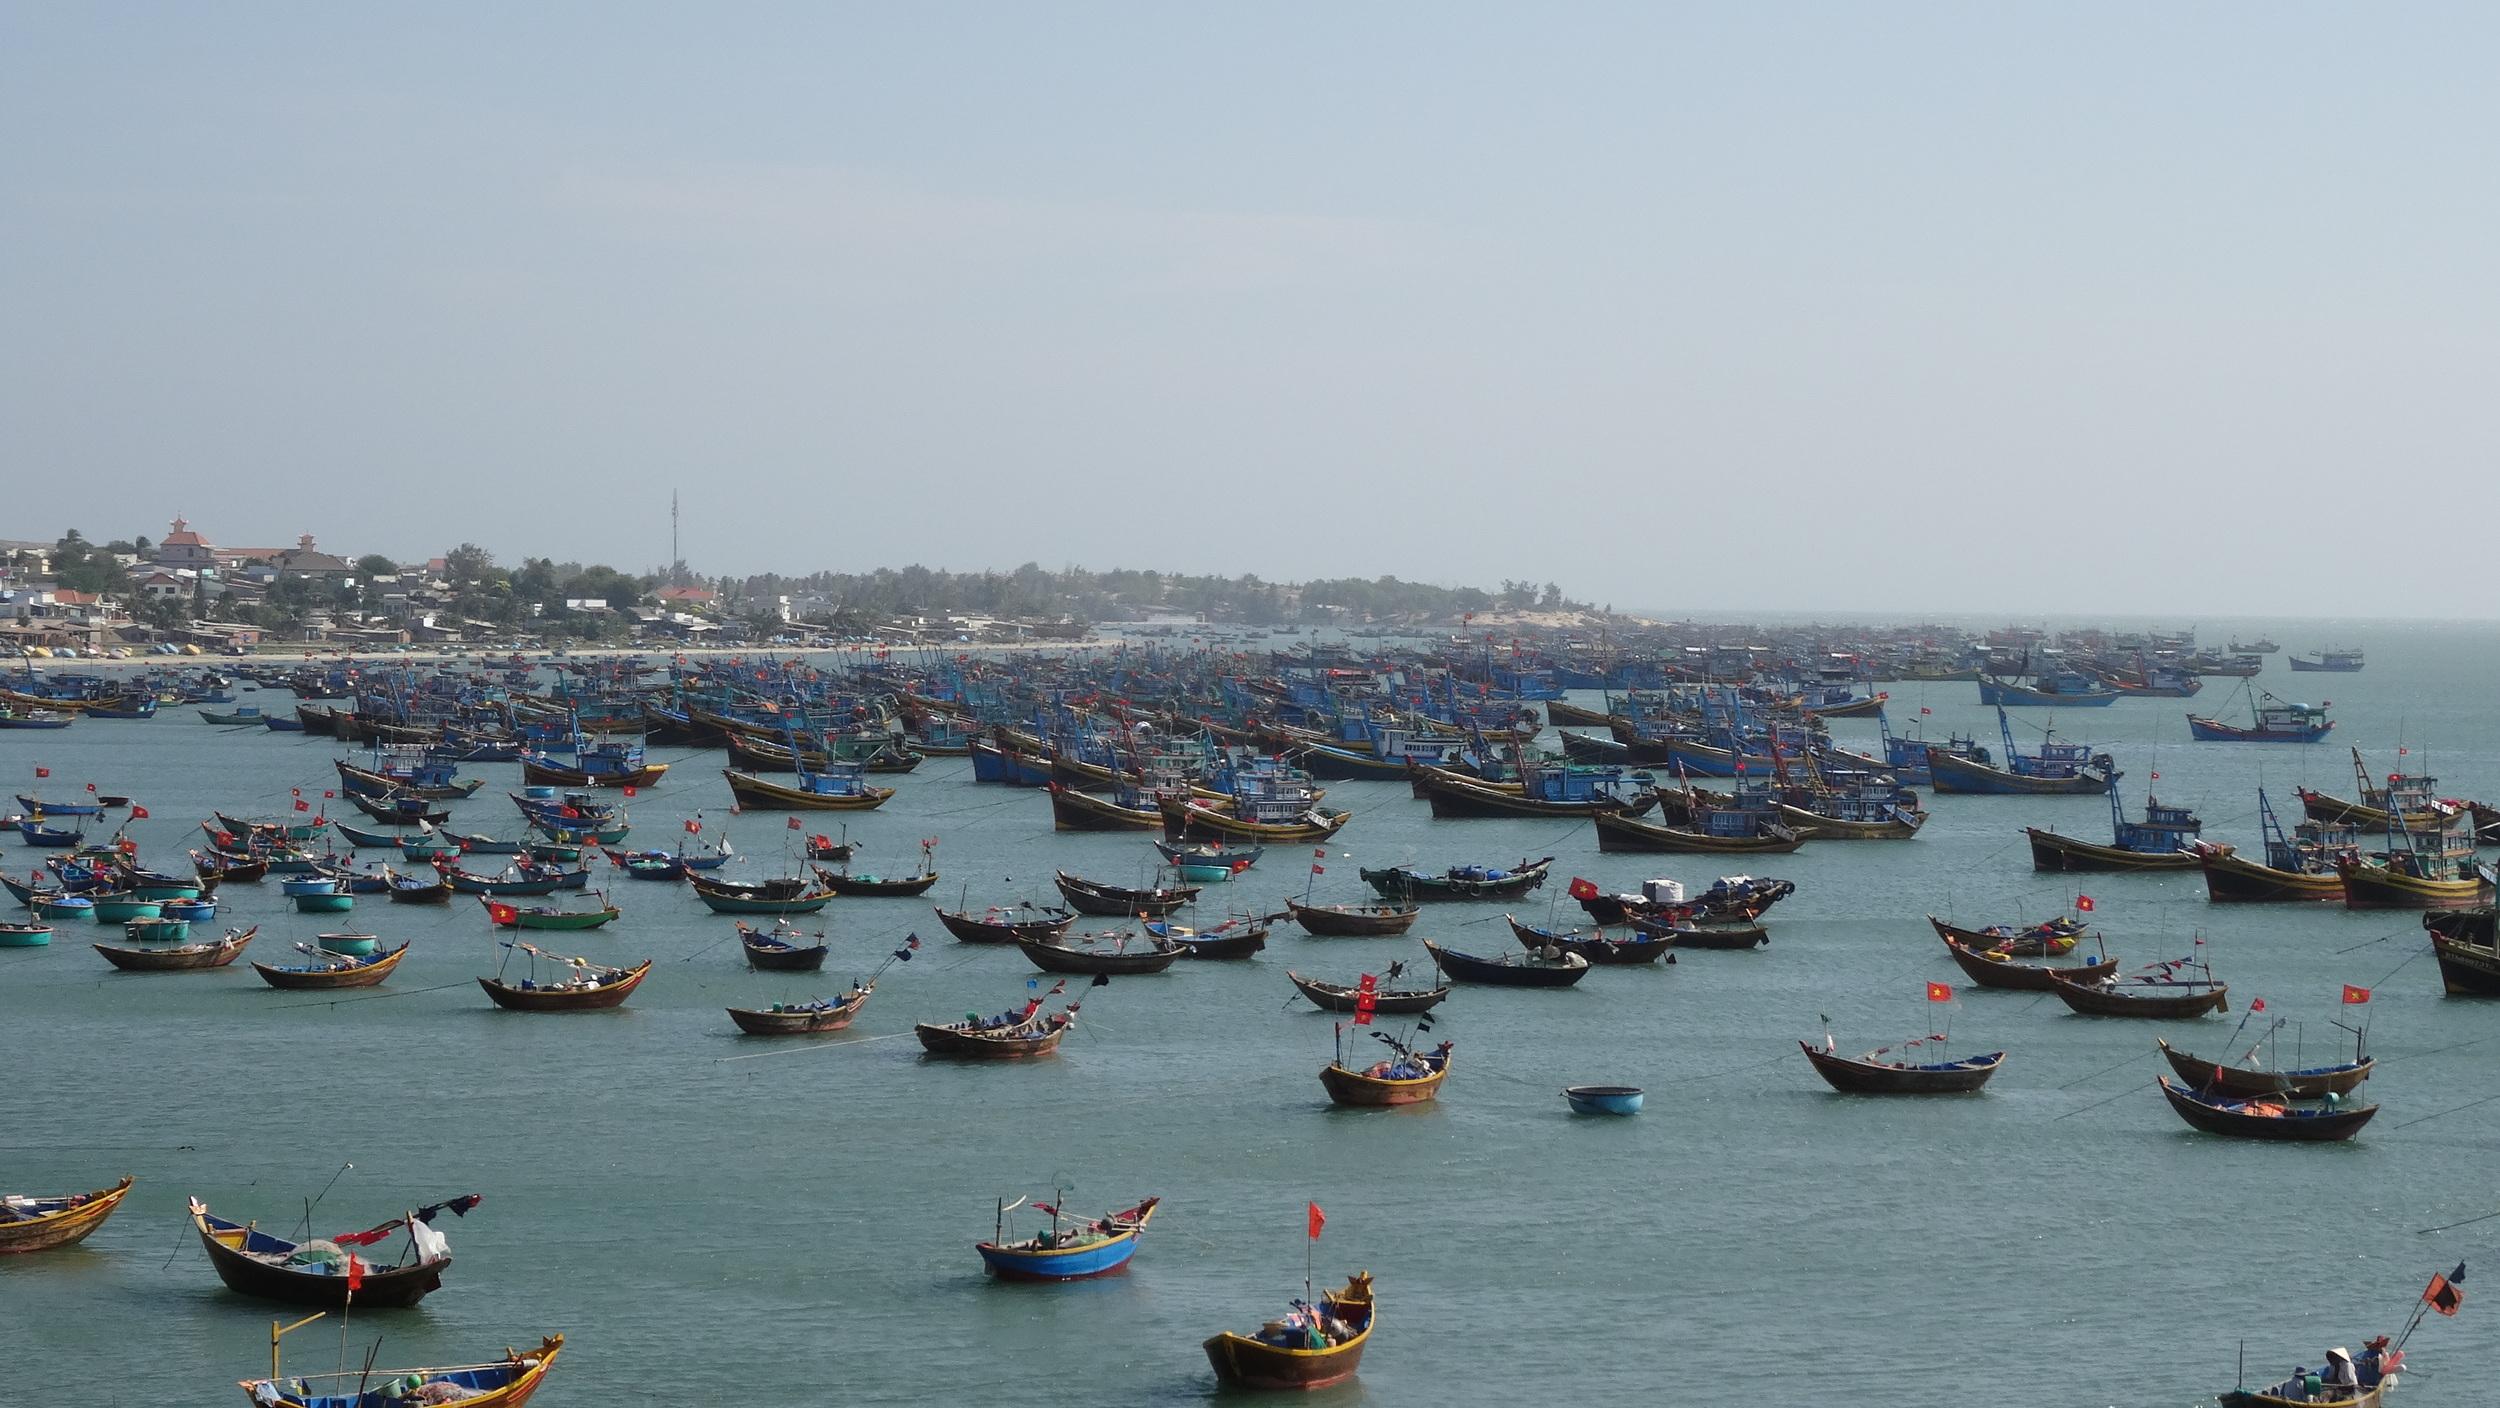 Small fishermen boats, South China Sea.